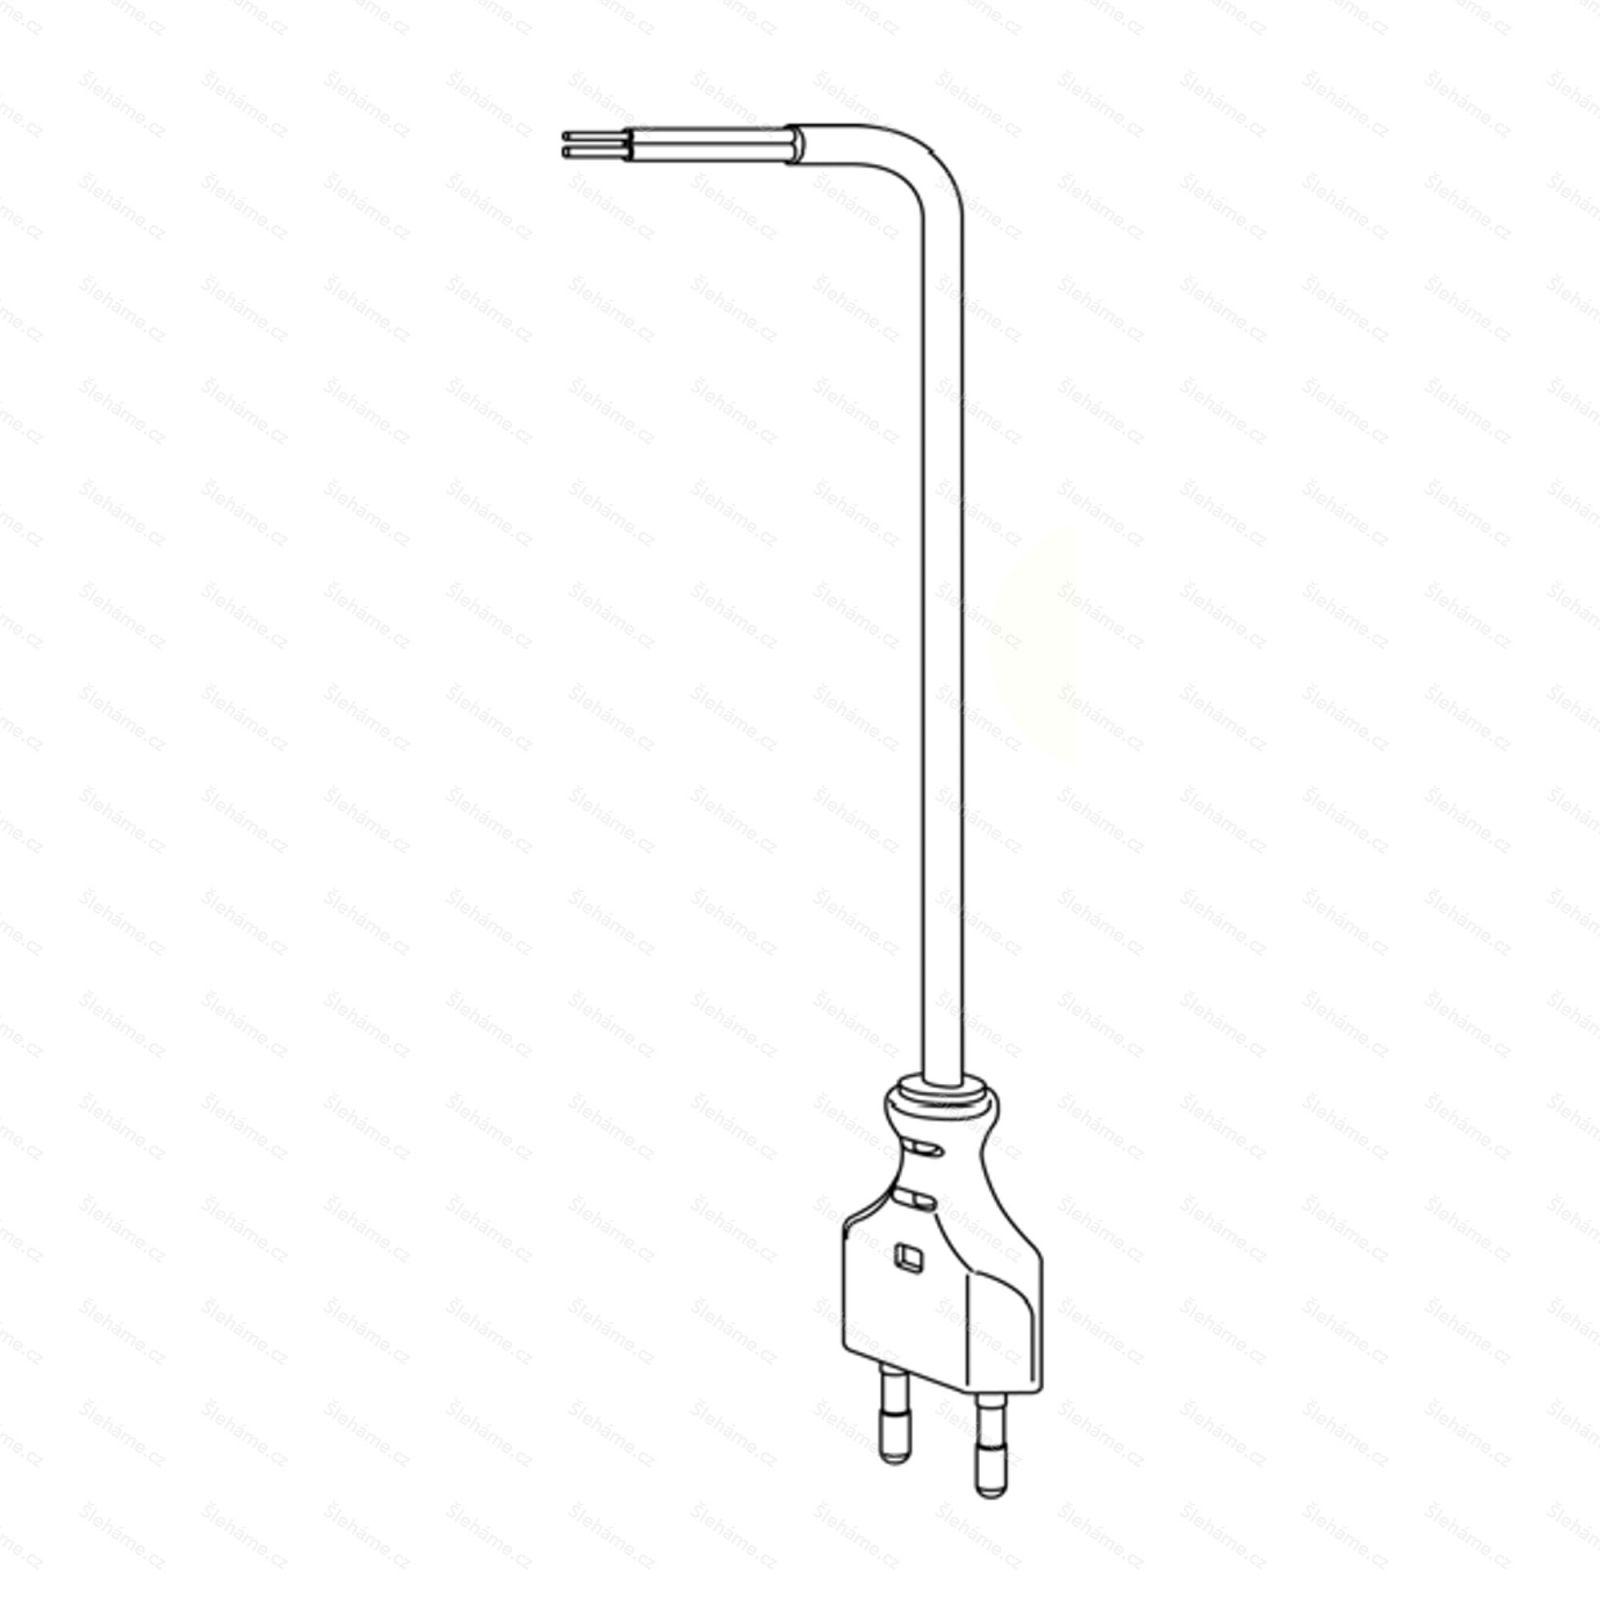 Kabel Bamix rovný 190 cm, šedý